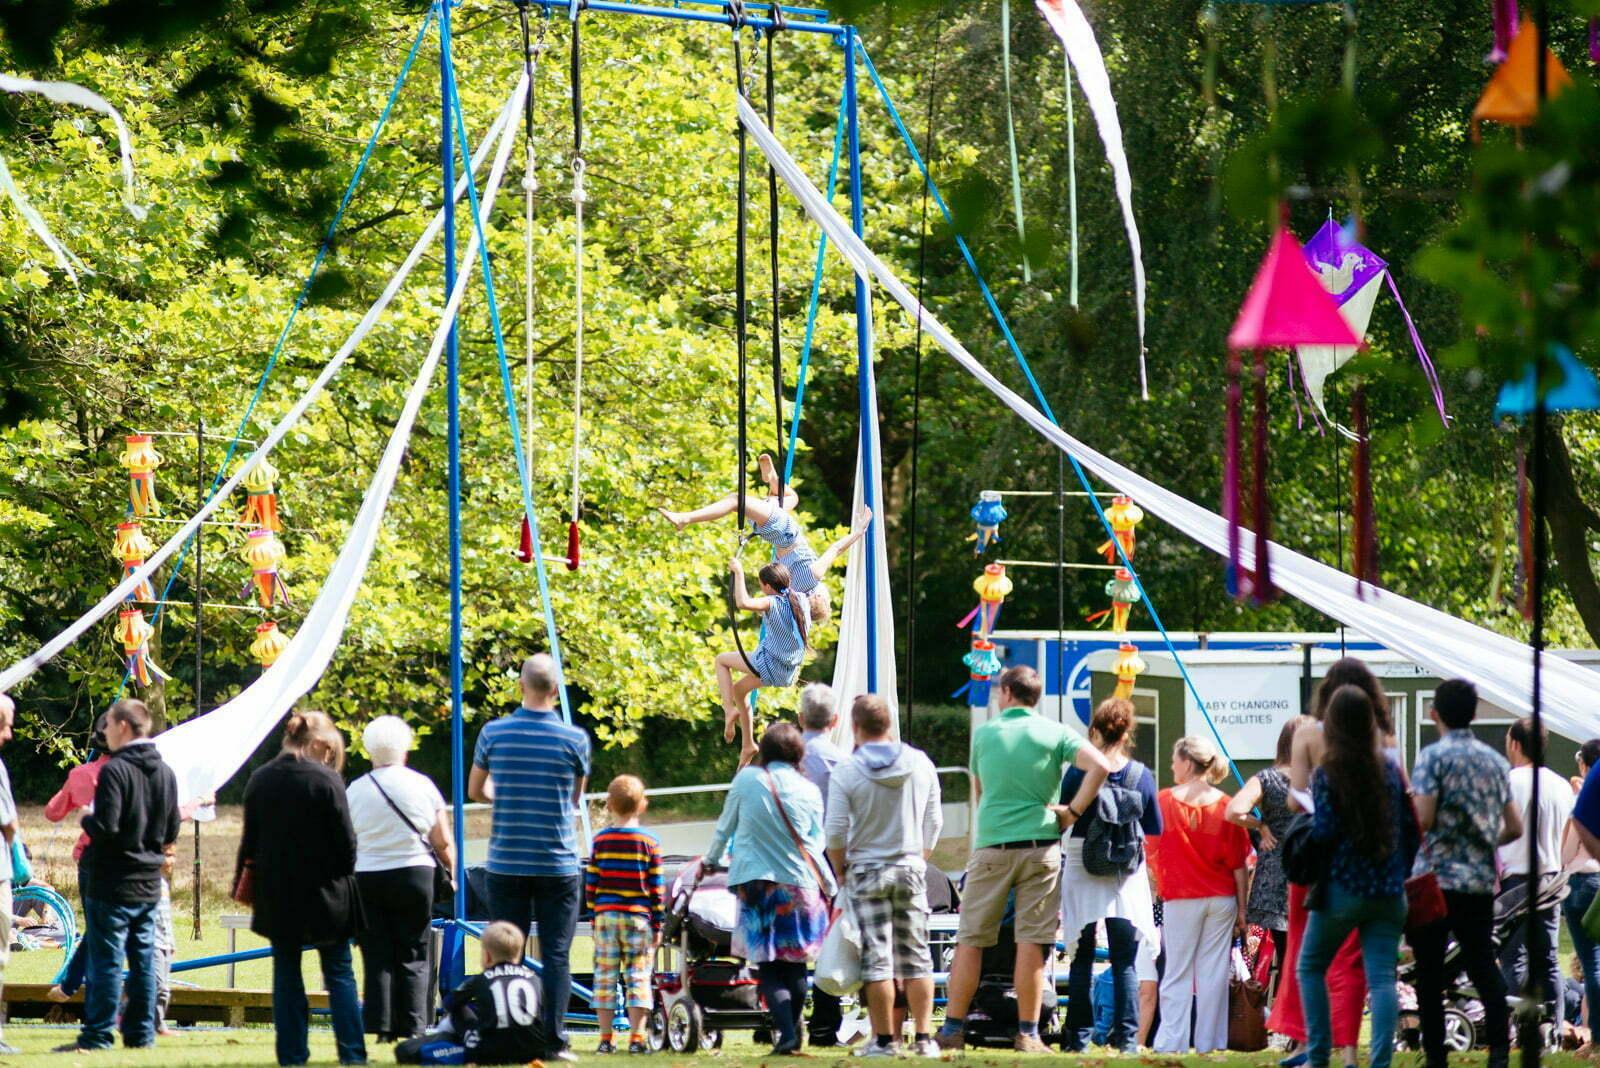 limfestival-sunday-pete-carr-2686